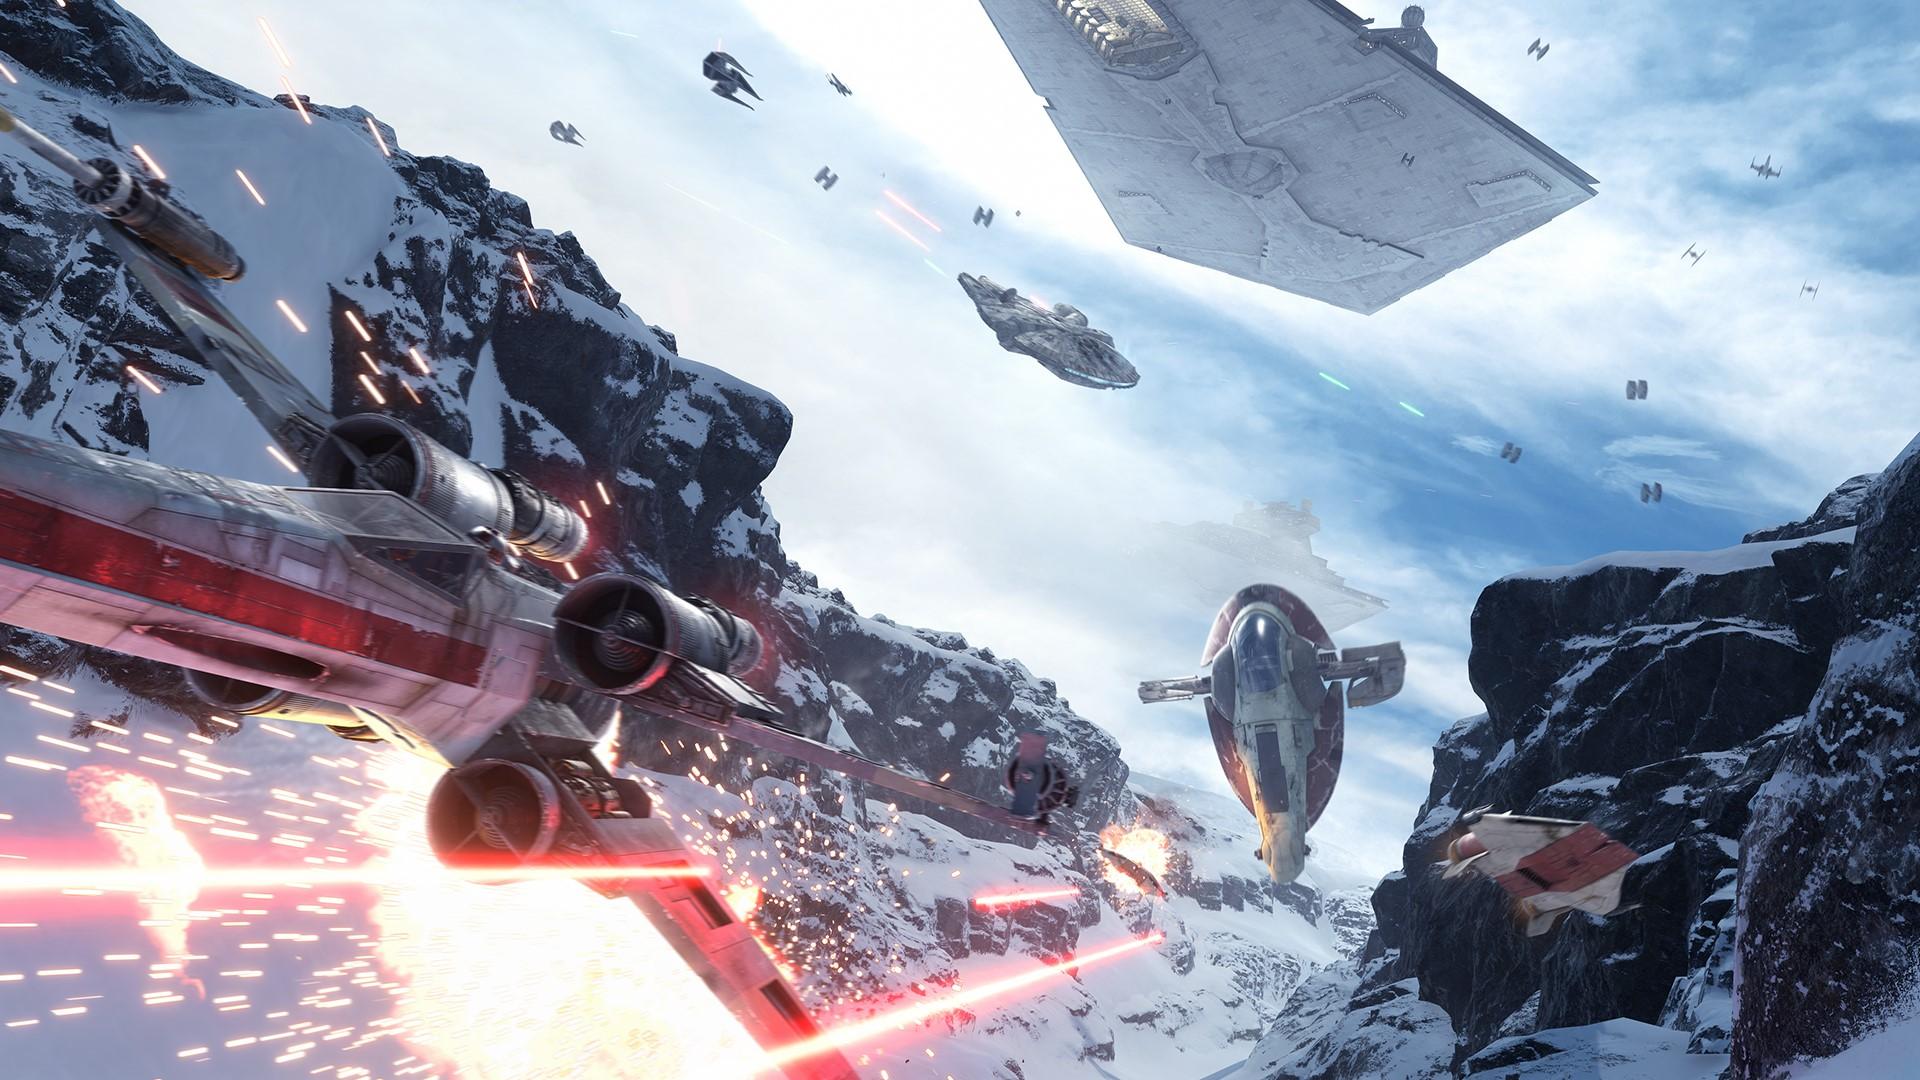 Visceral показали концепты будущей Star Wars